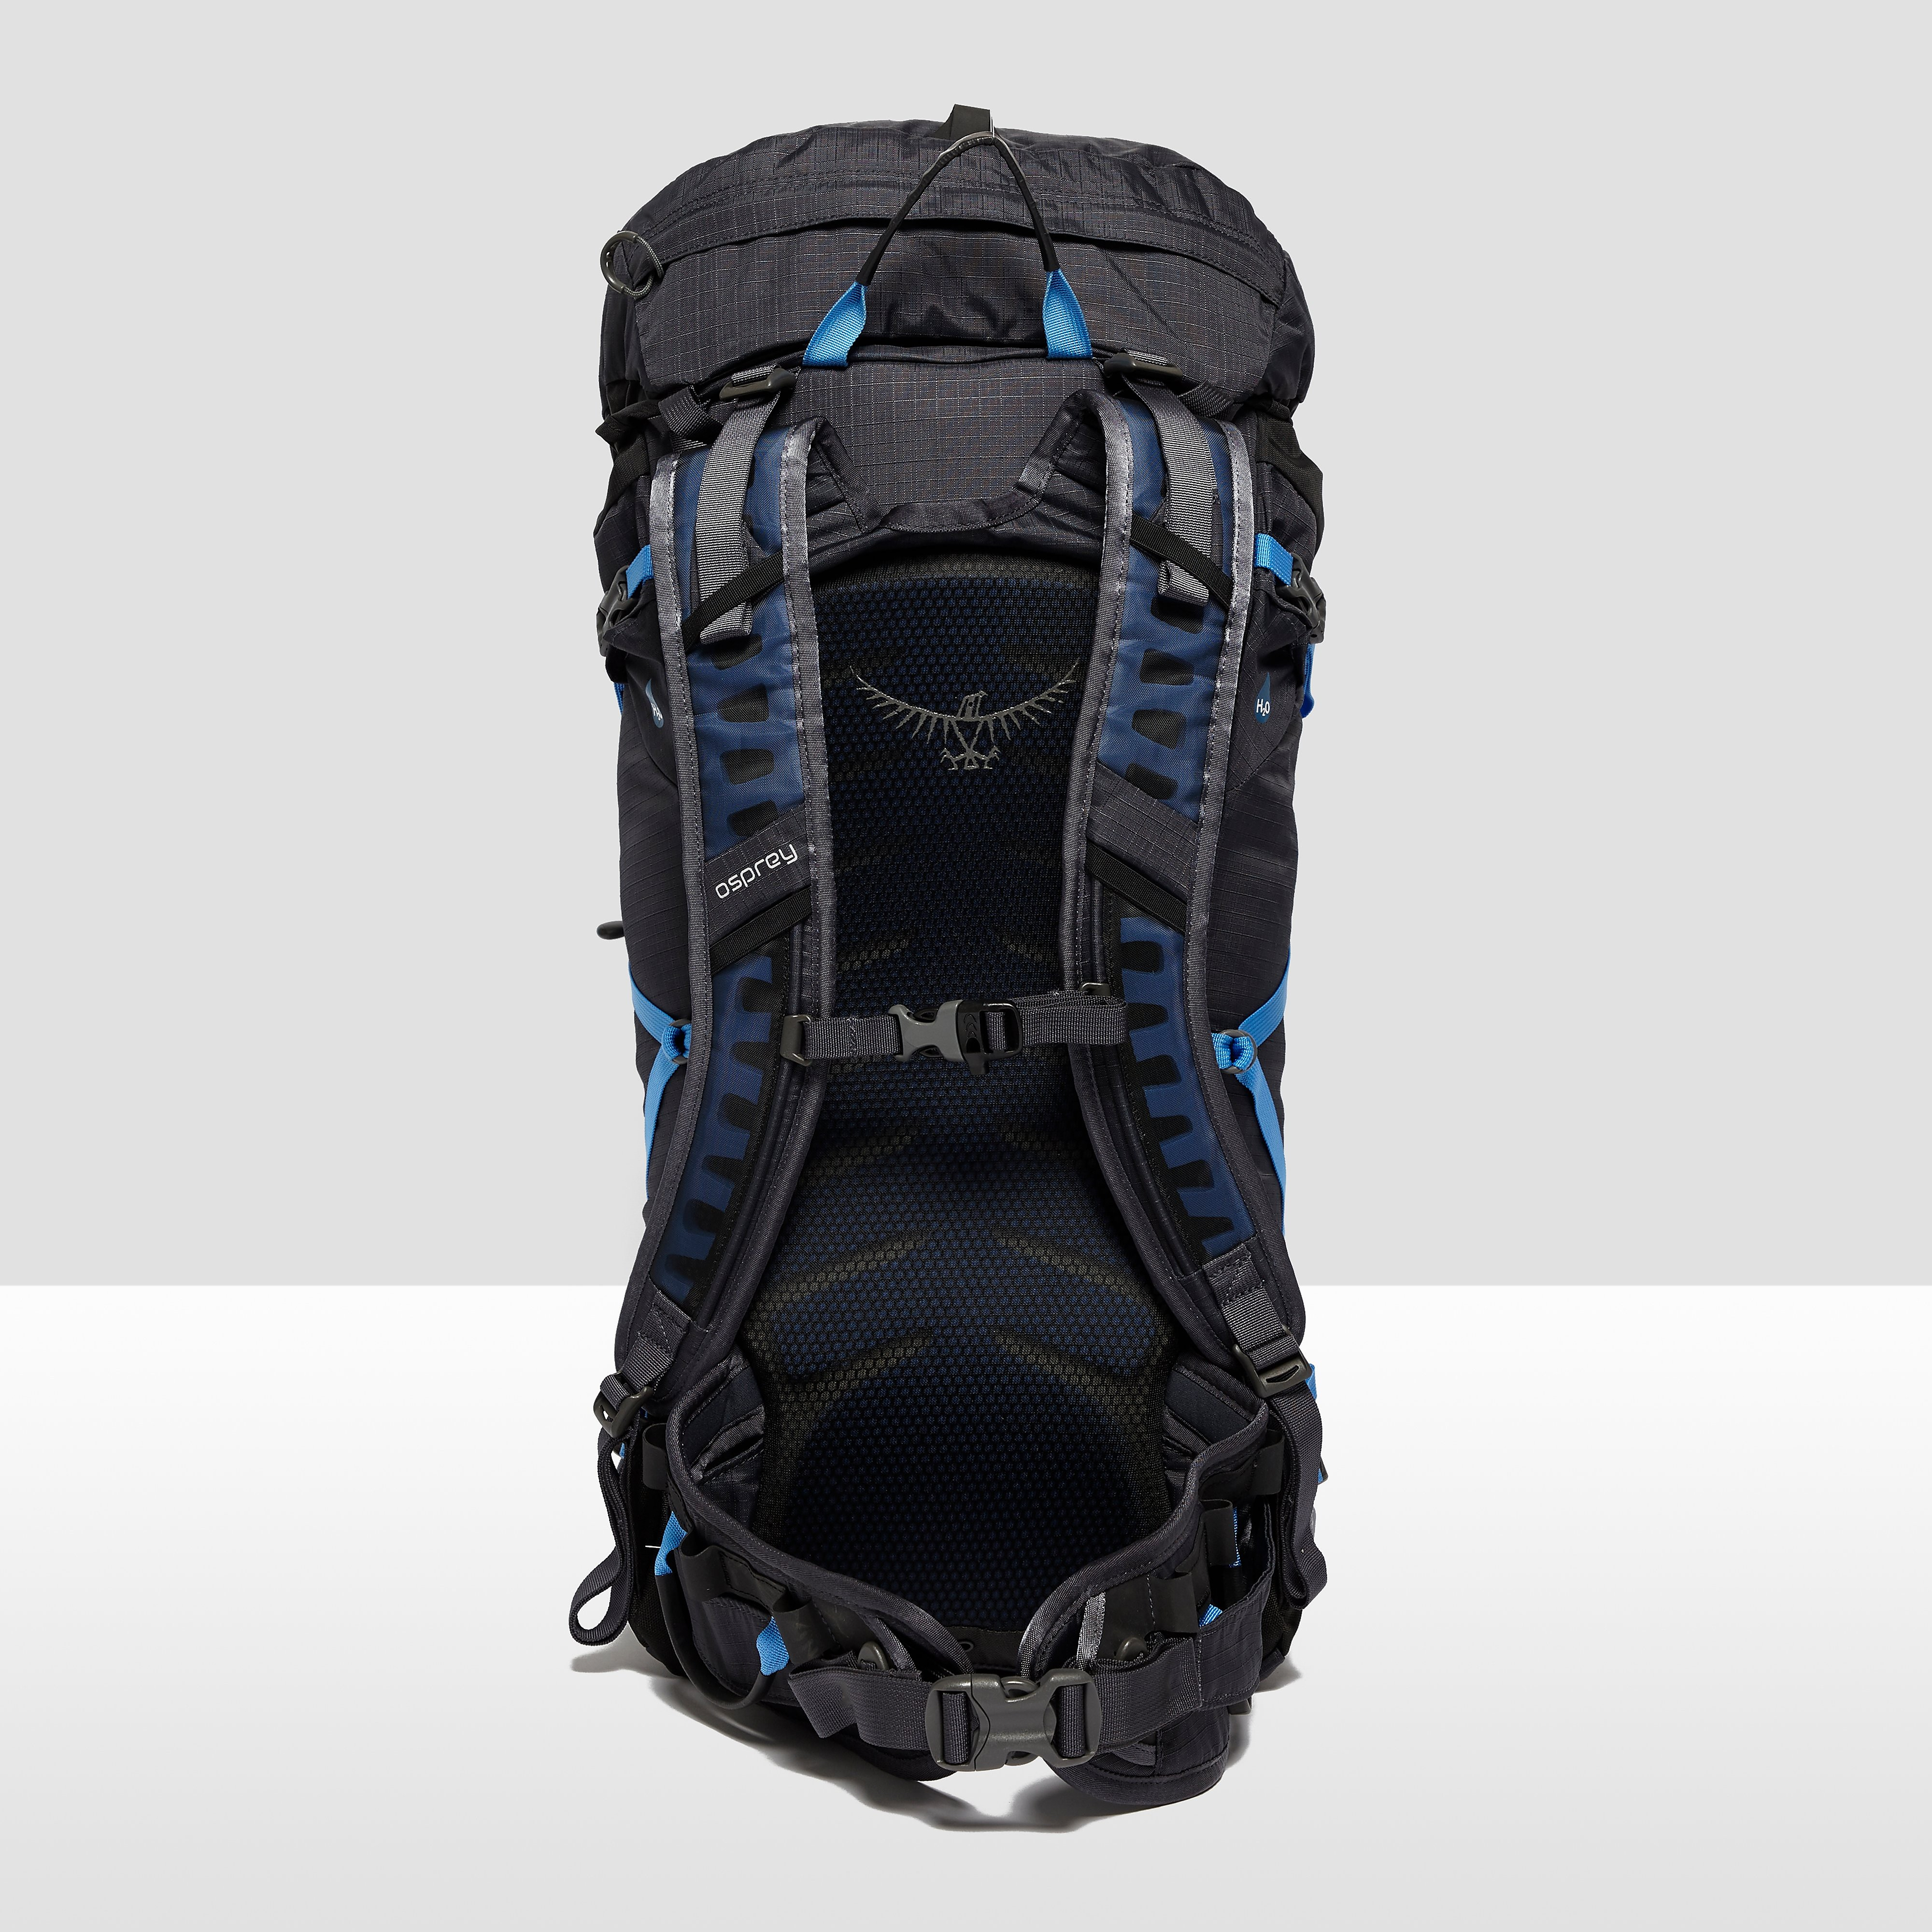 Osprey Mutant 38 Climbing Backpack